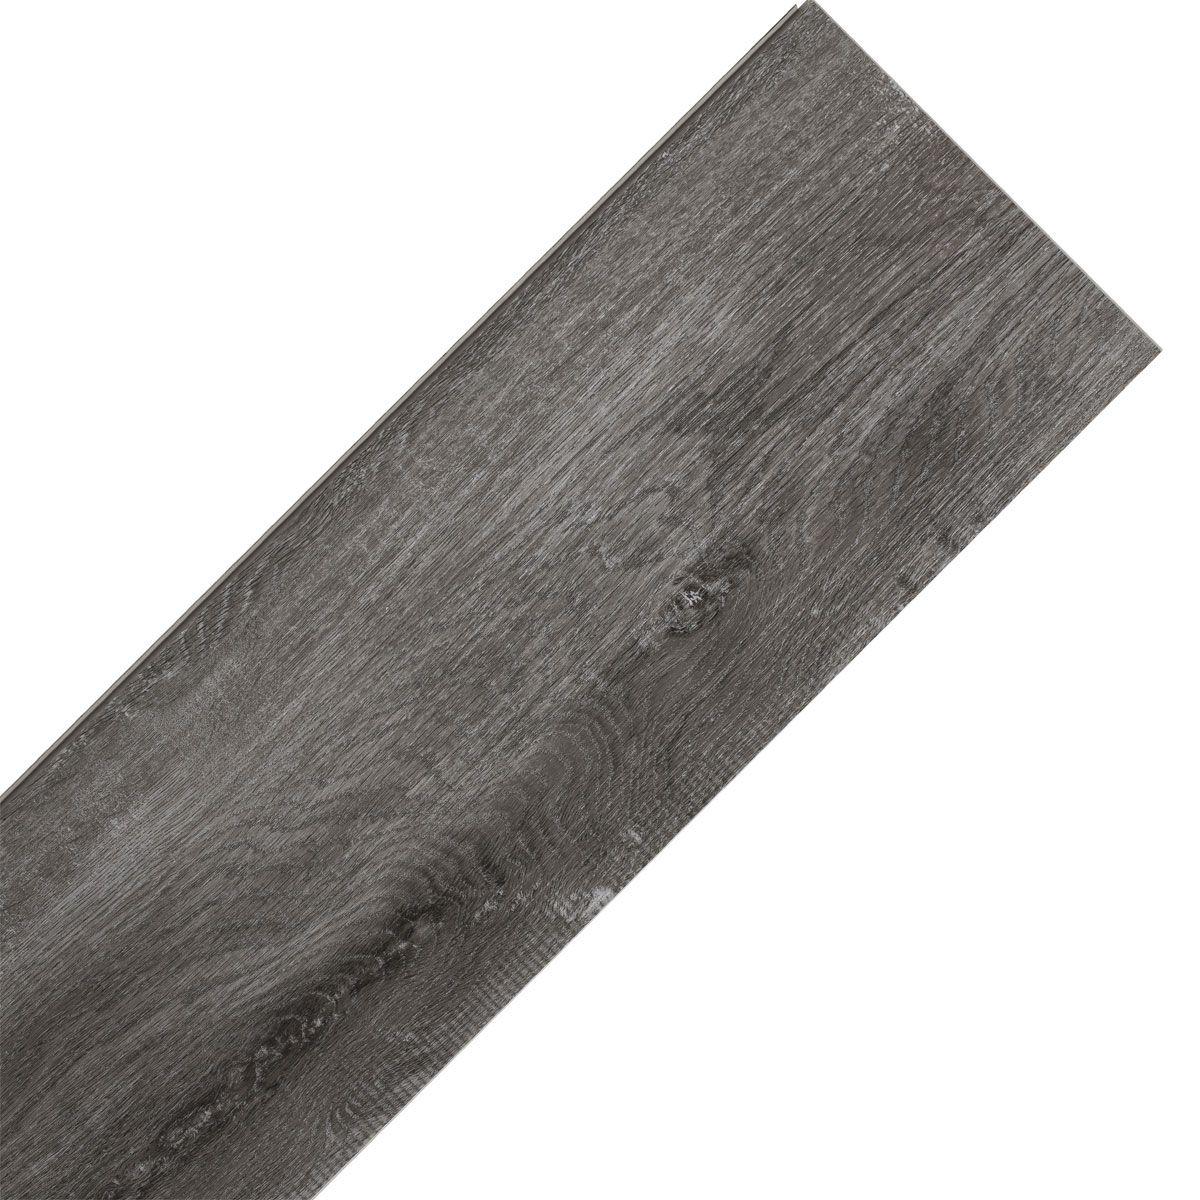 Lame PVC clipsable chêne gris 5,5mm Cortina